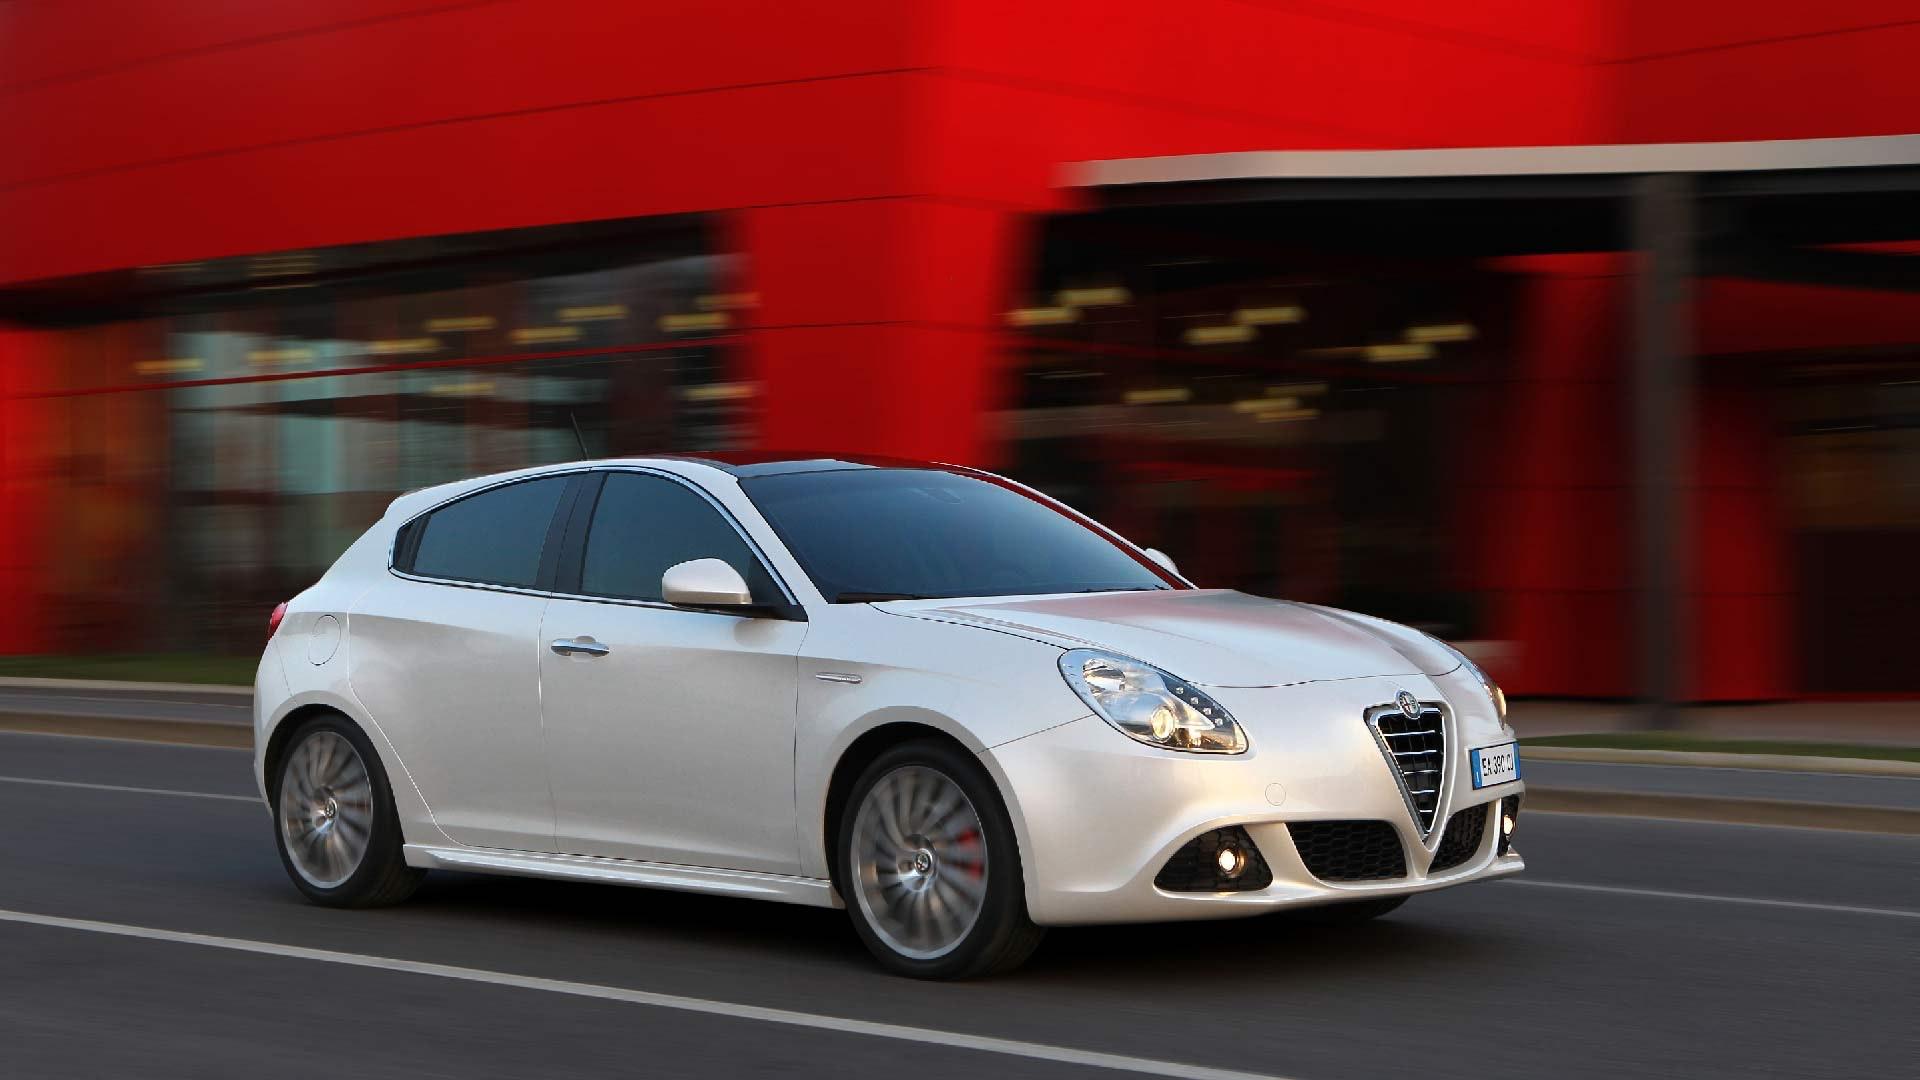 Alfa Romeo Giulietta hvid front